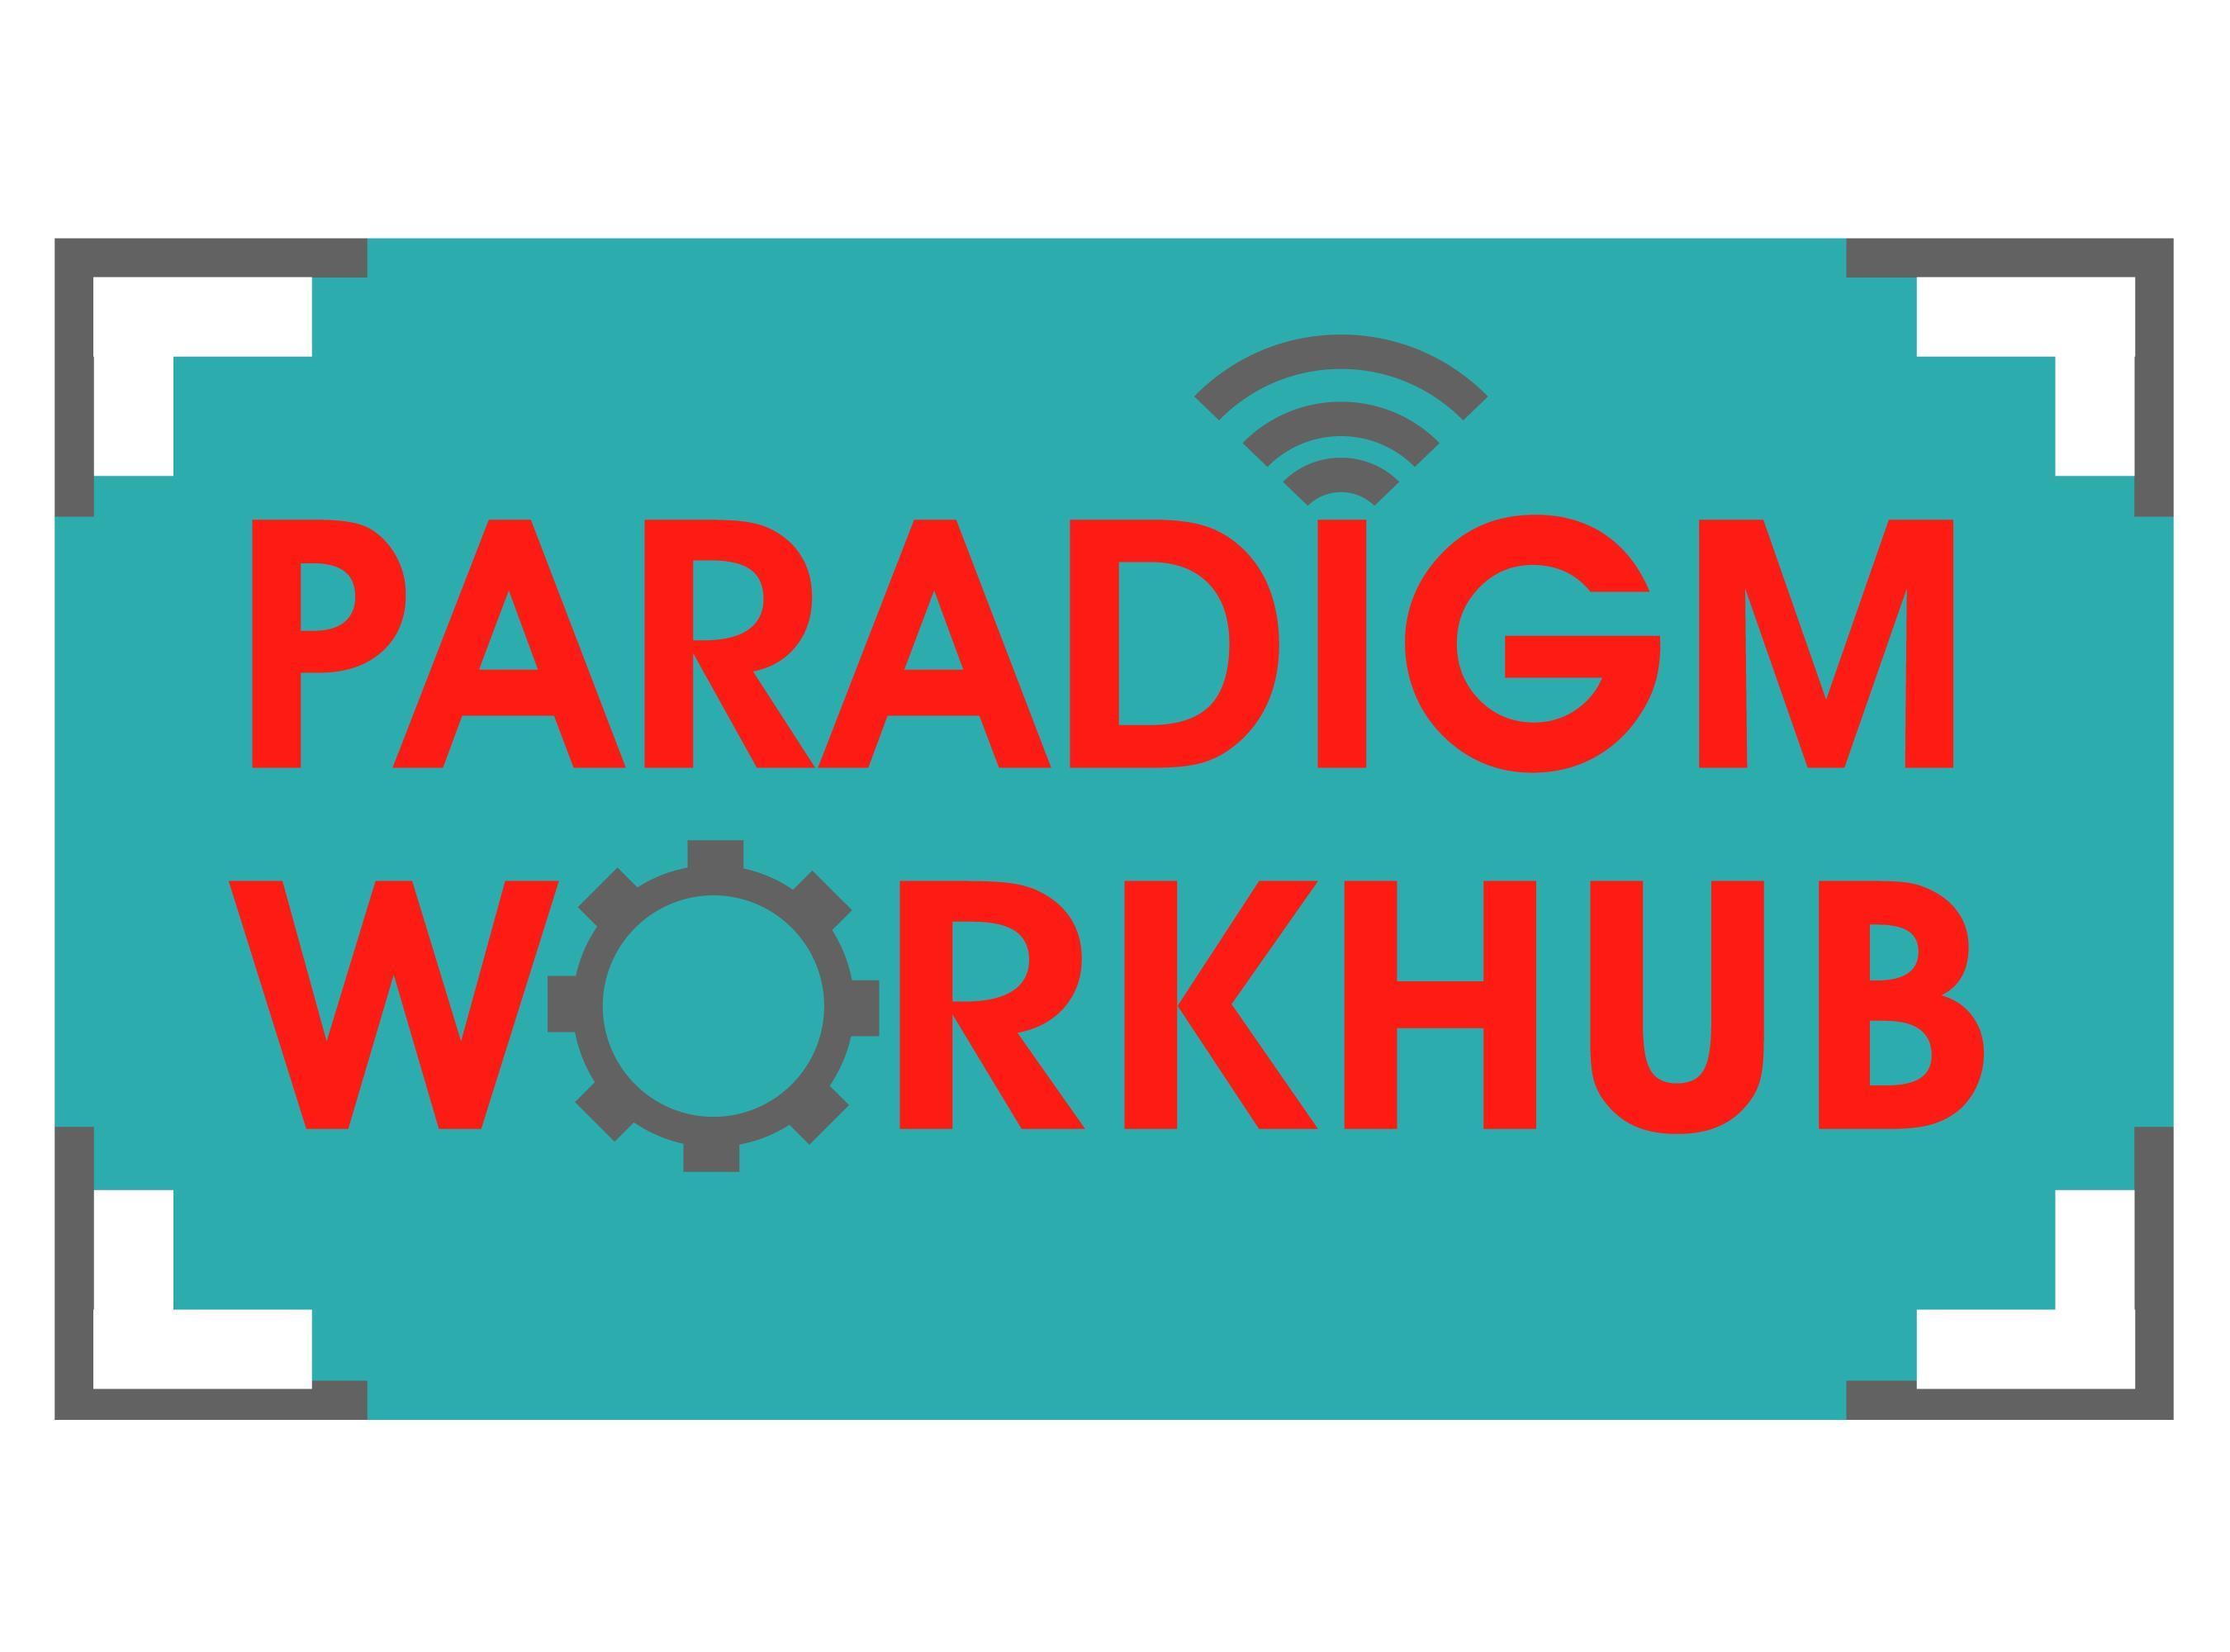 Logo of PARADIGM WORKHUB